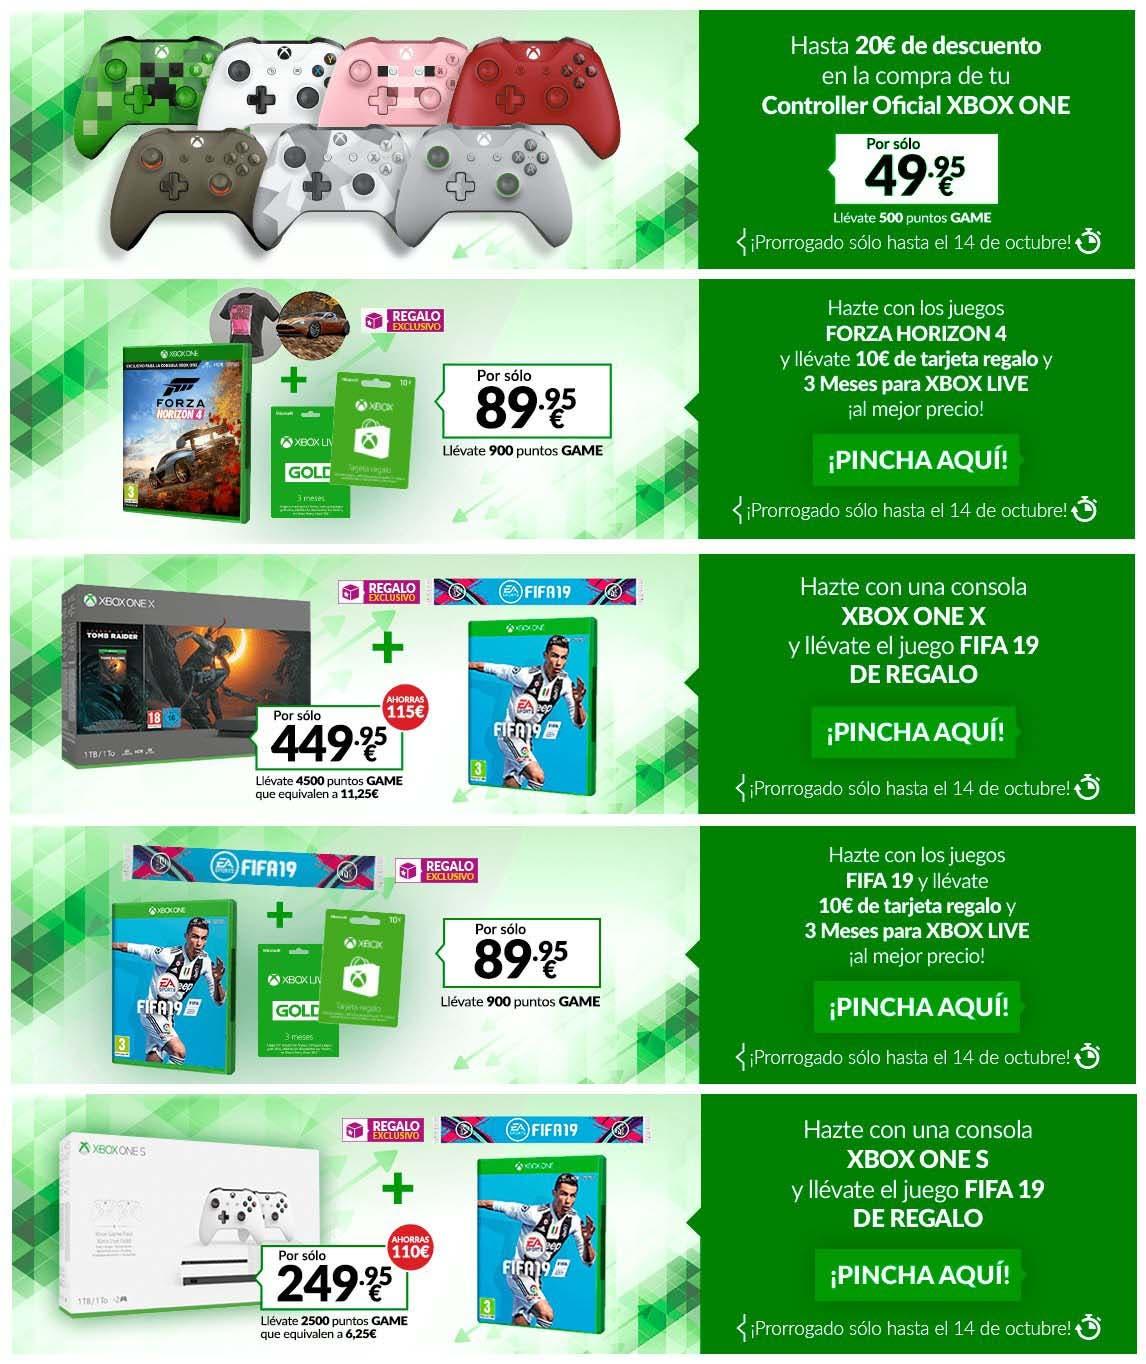 El Plan Renove de Xbox One X se prorroga esta semana en GAME 2